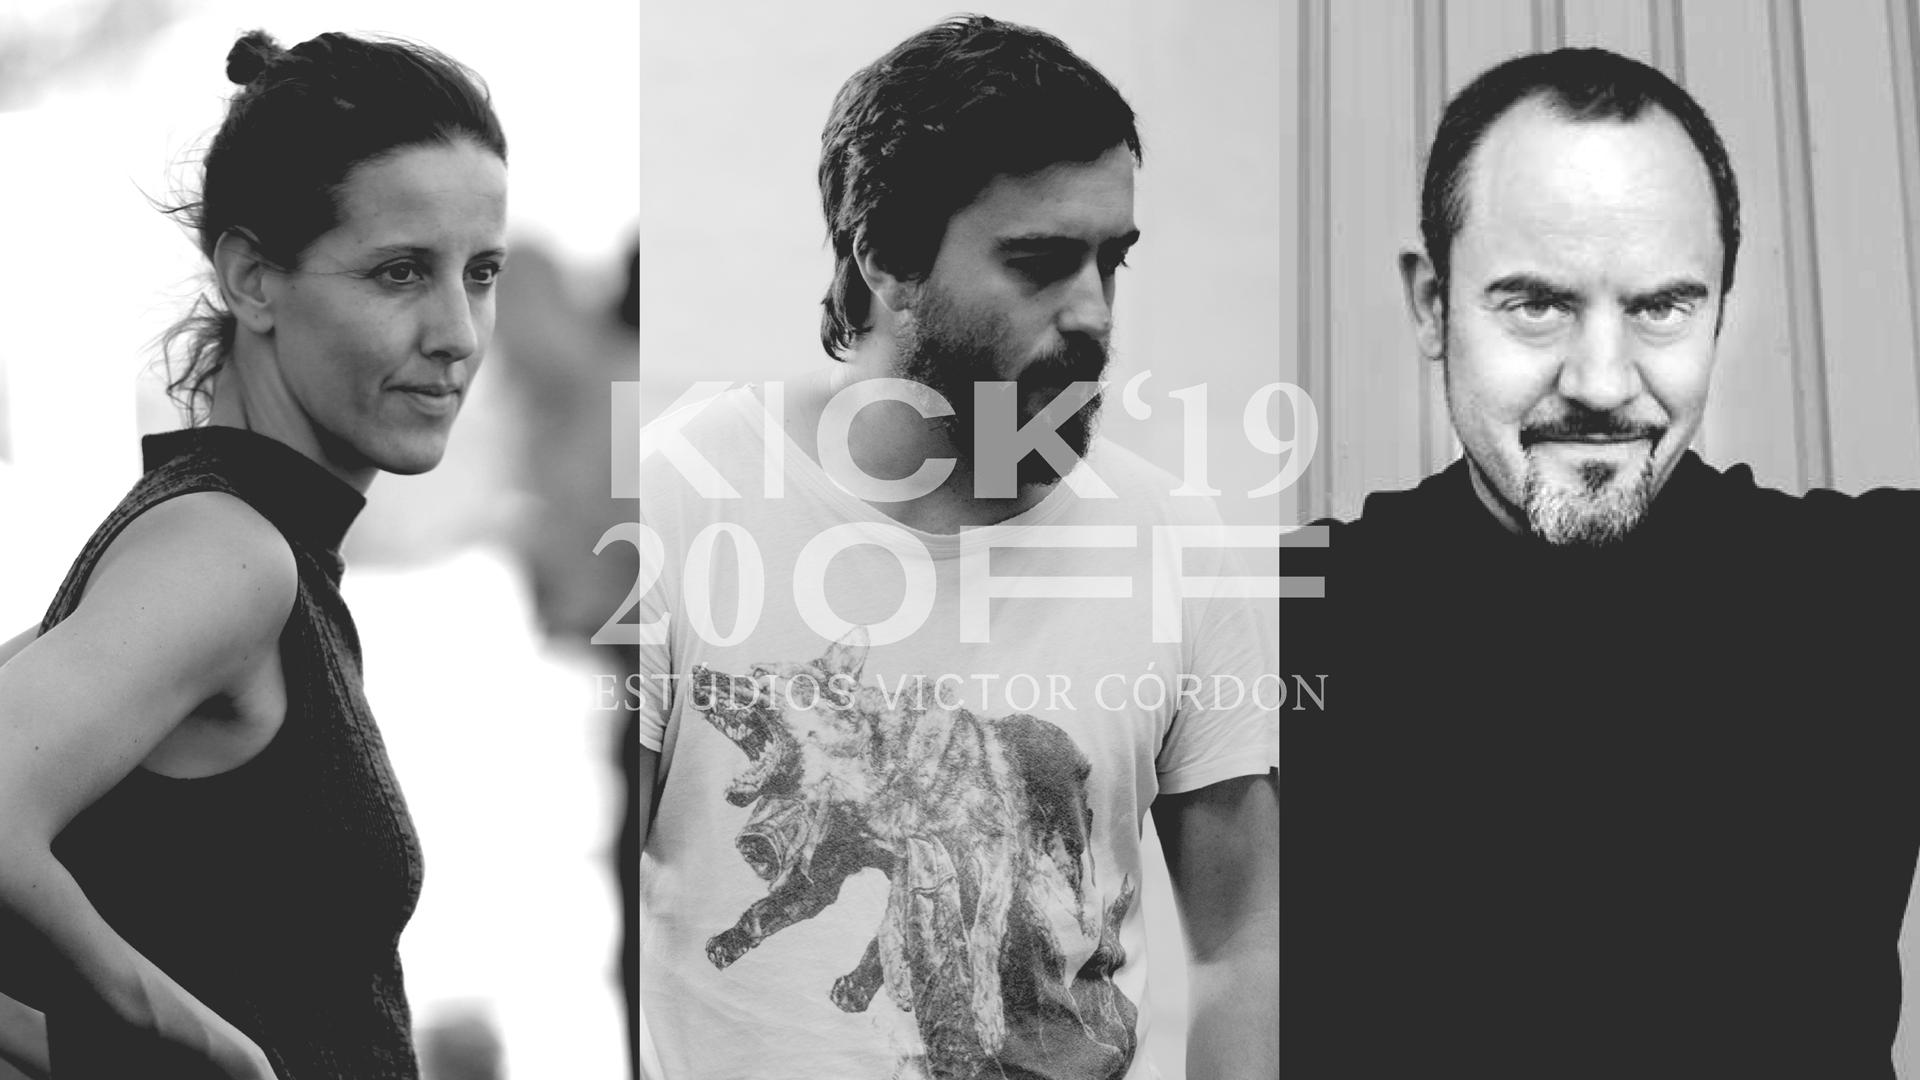 KICK OFF'19/20 – EVC